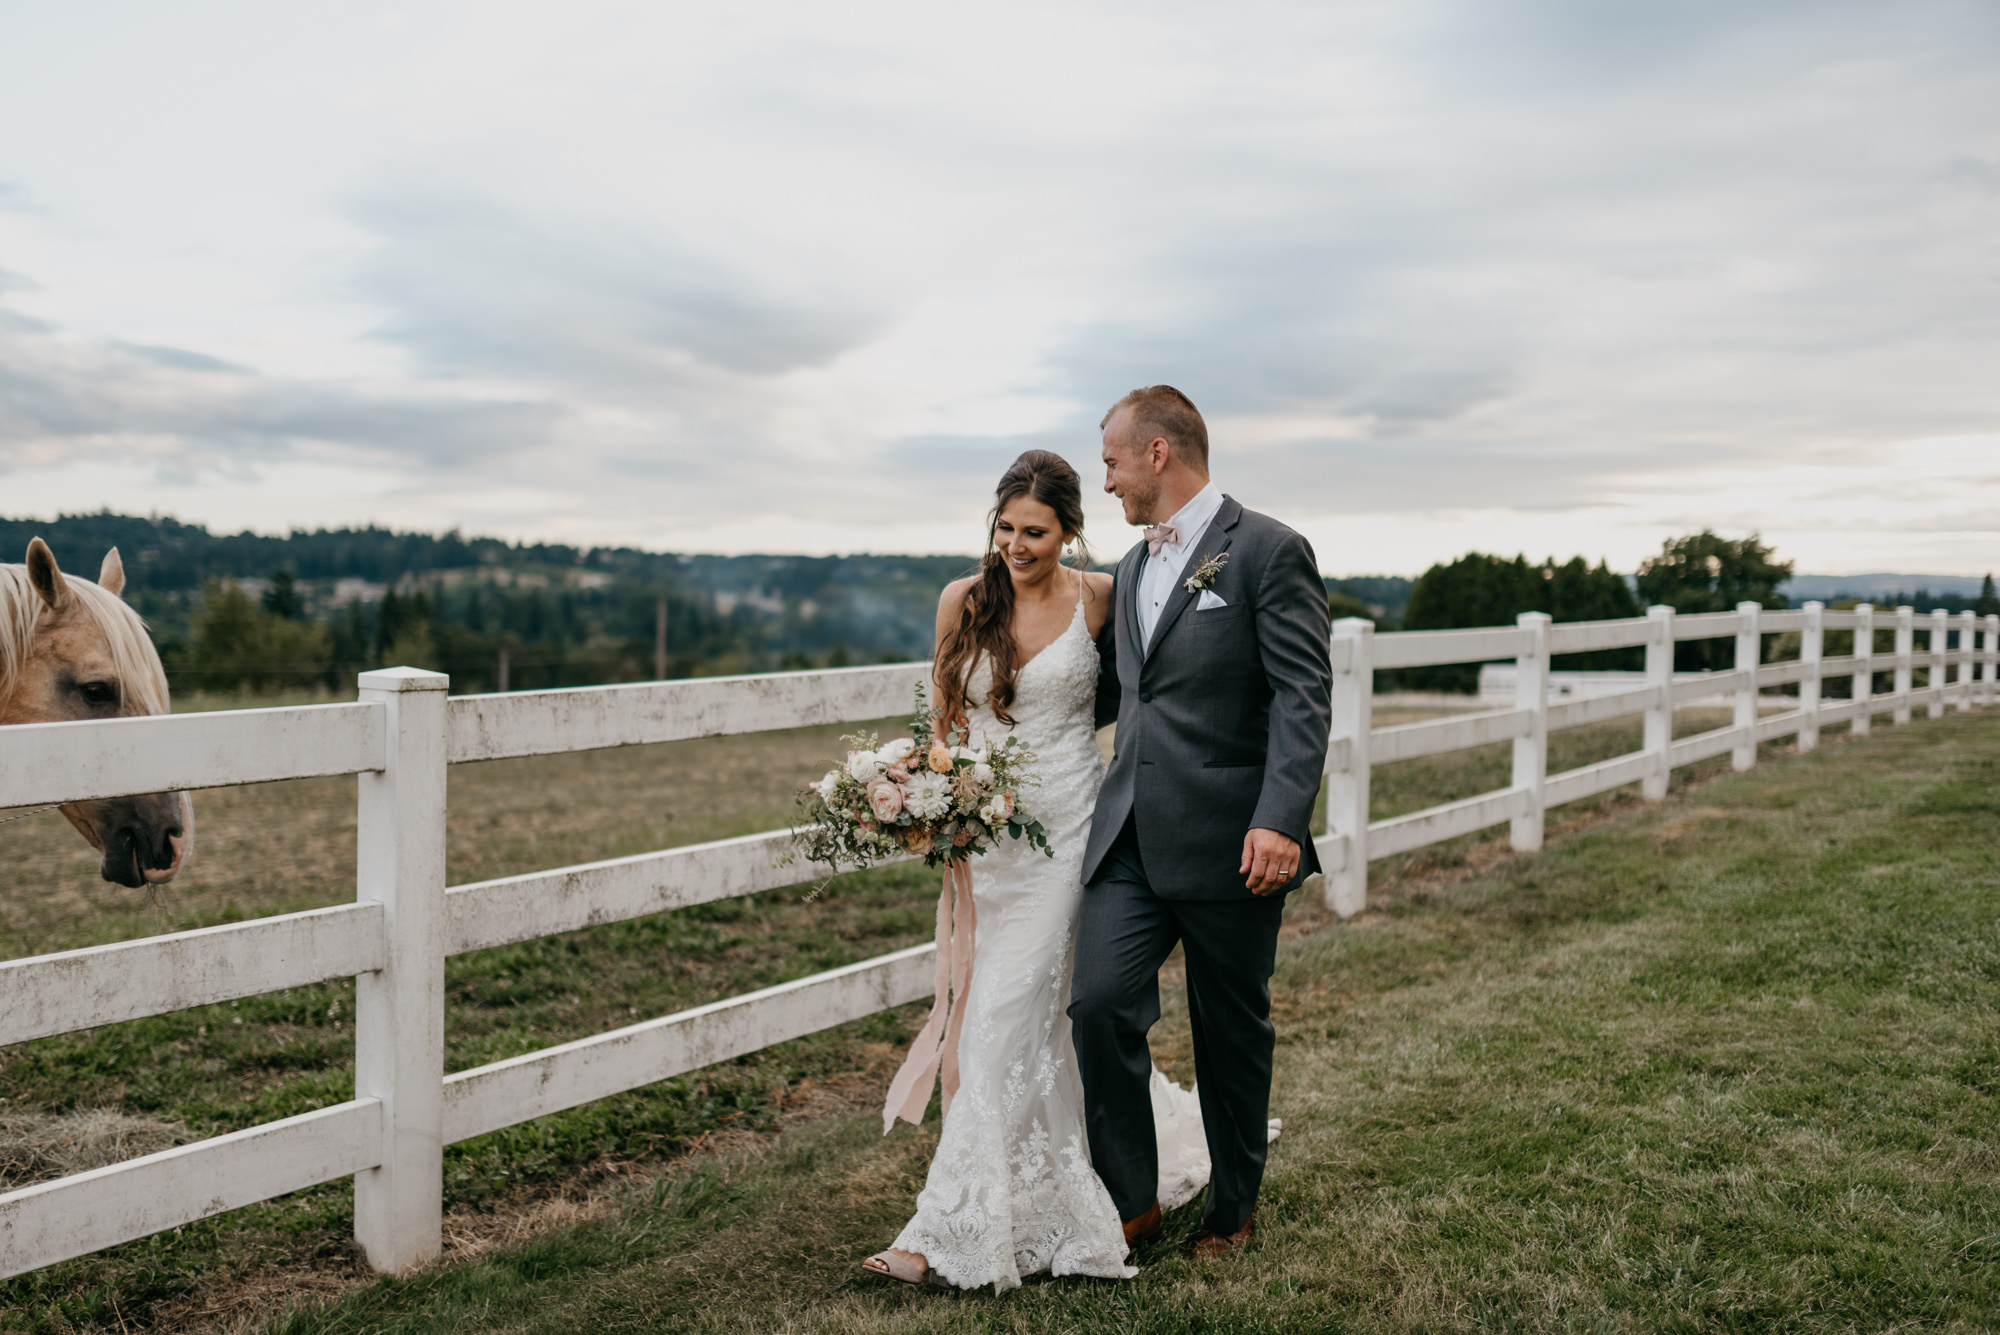 174-barn-kestrel-portland-northwest-horse-sunset-wedding.jpg